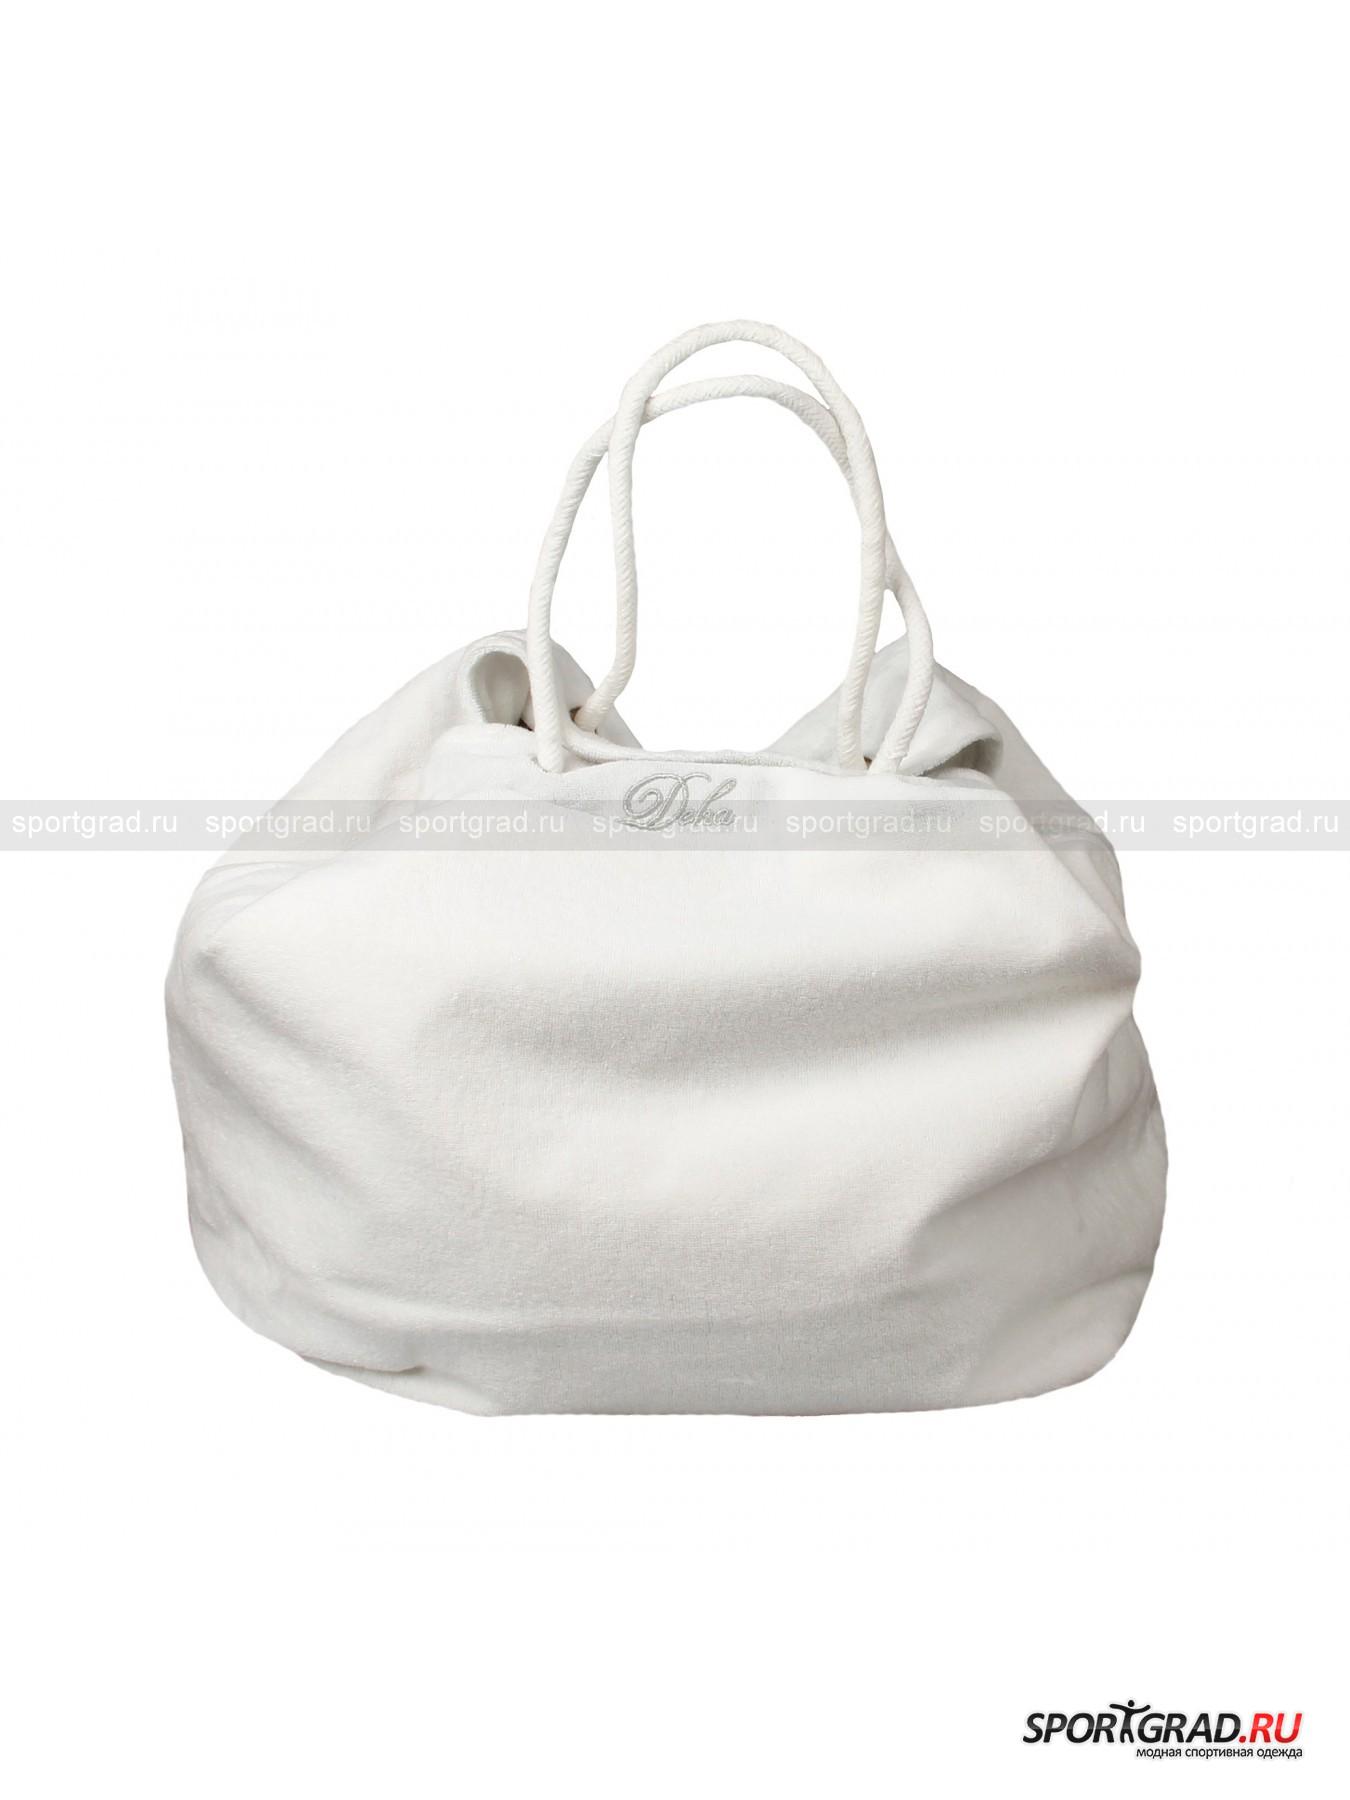 Женская сумка DEHA Unica от Спортград